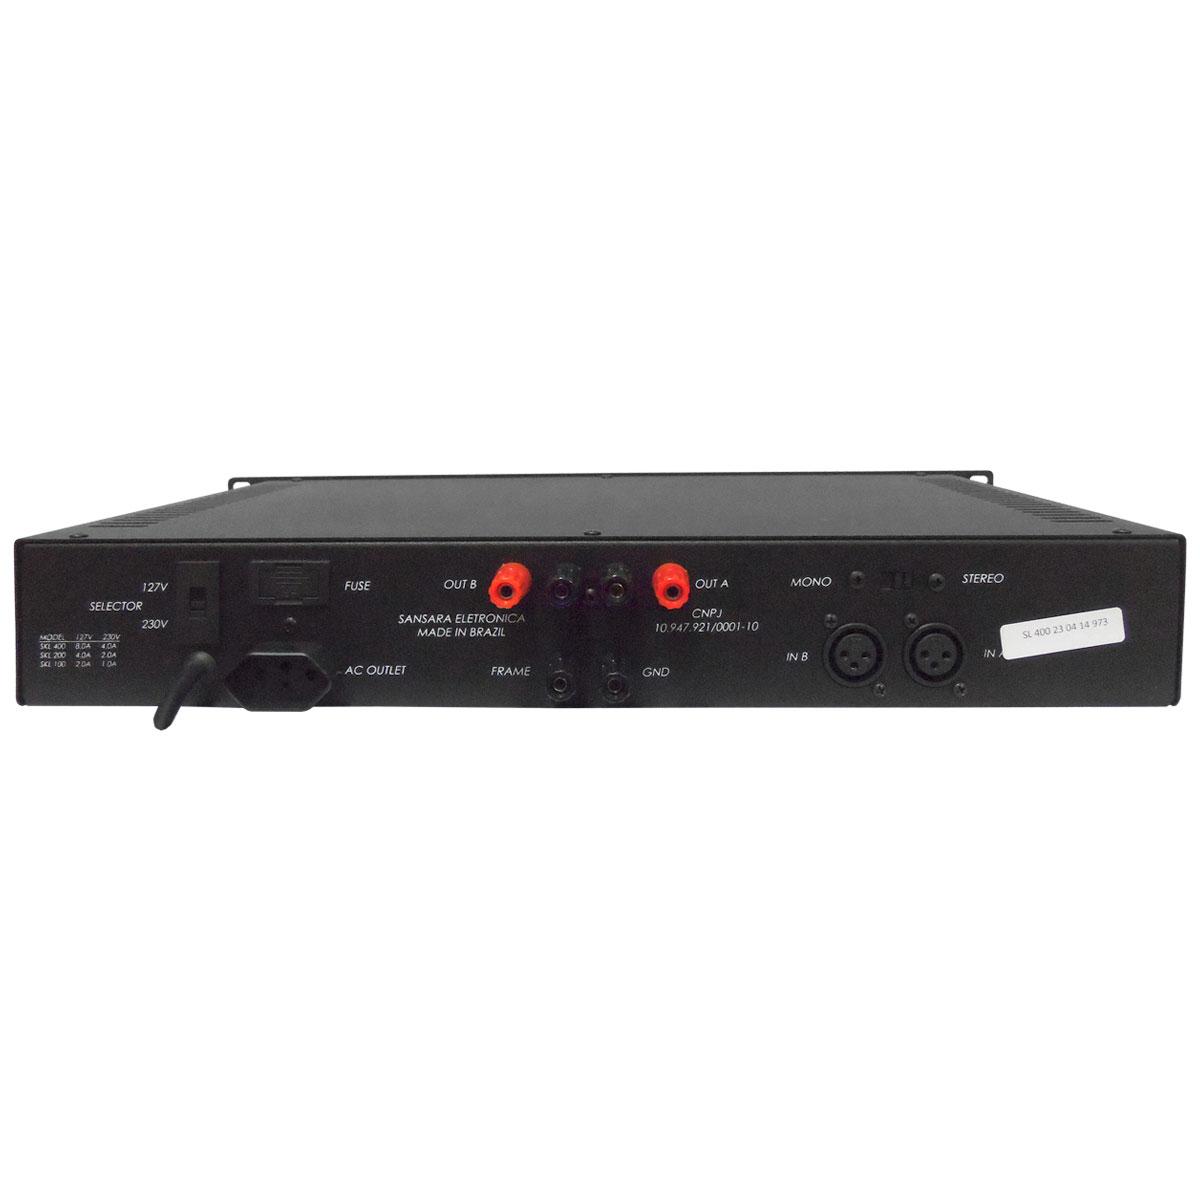 SL400 - Amplificador de Linha Mono / Estéreo 400W SL 400 - Sansara